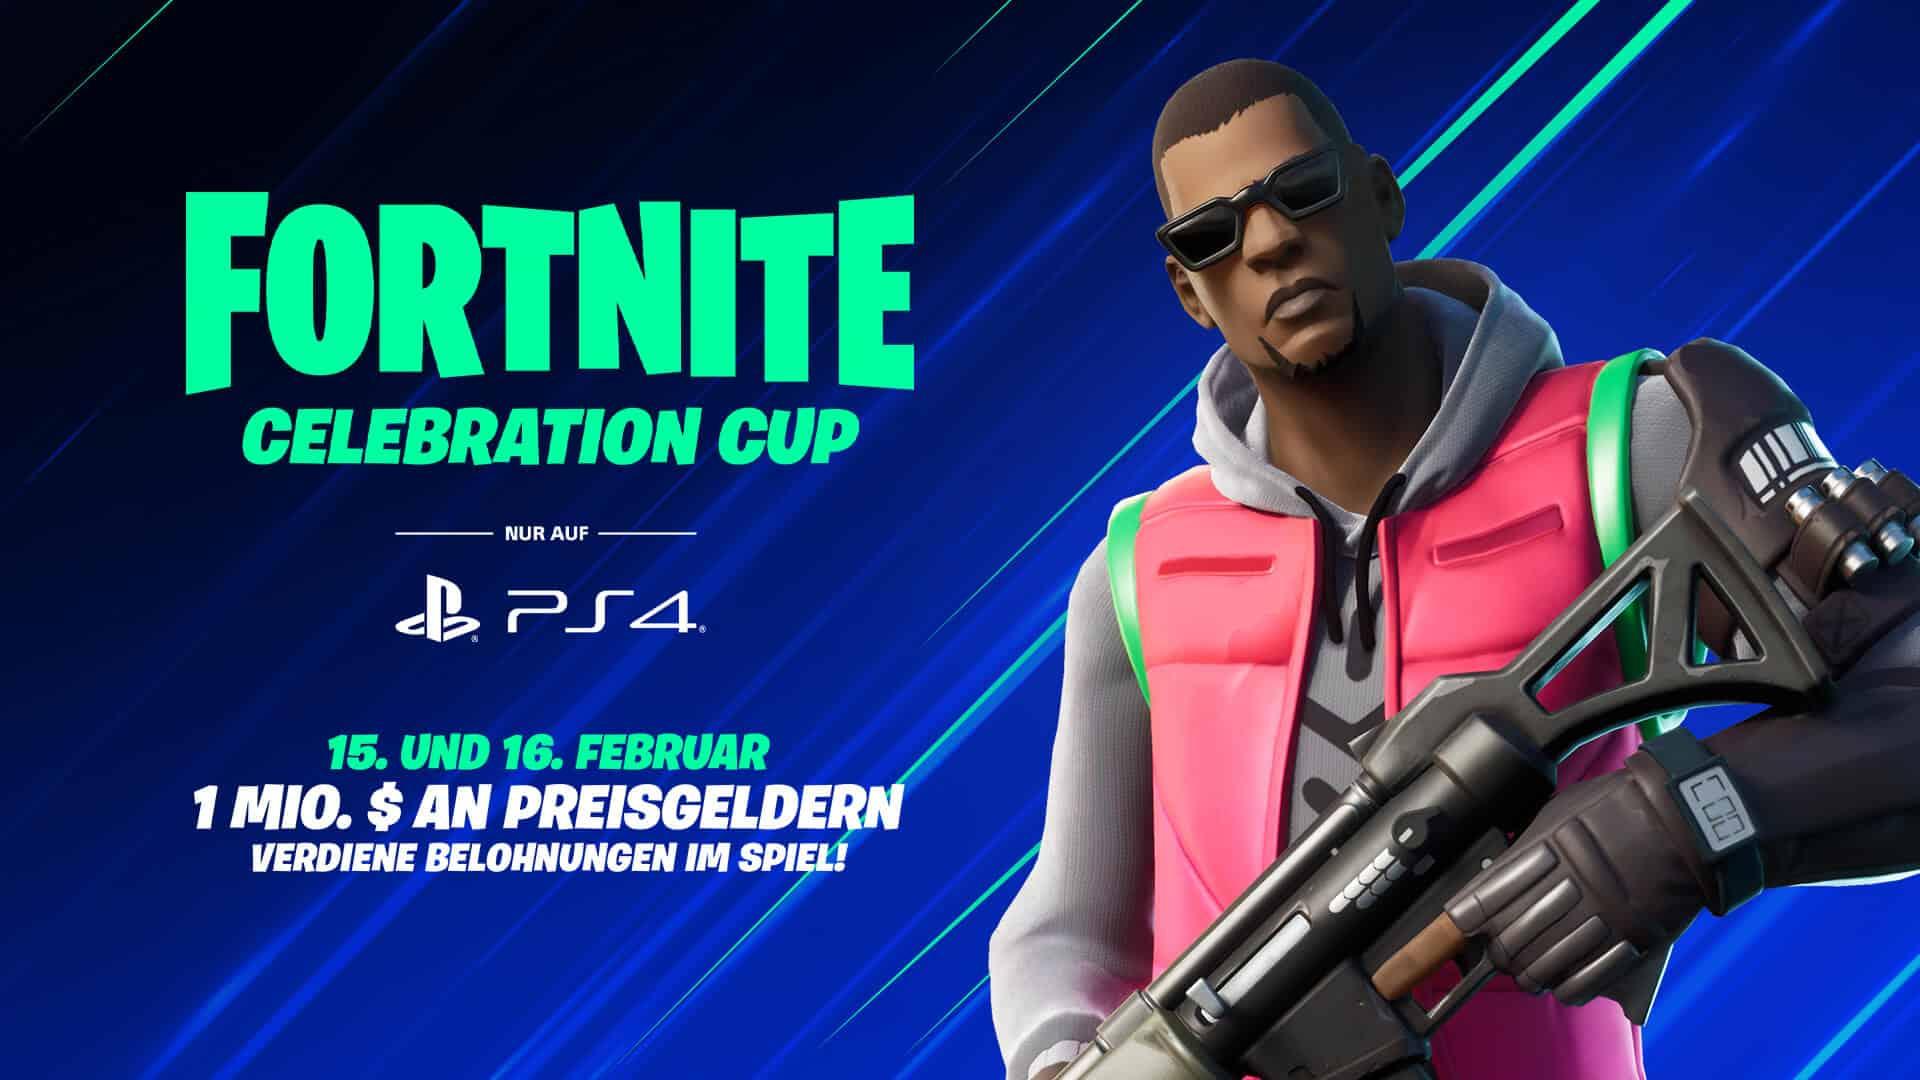 Fortnite blog celebration cup only on ps4 DE 11BR Sony CelebrationCup Social 1920x1080 8e1ea8684cae911a2516acf53b28267d7f0a57d9